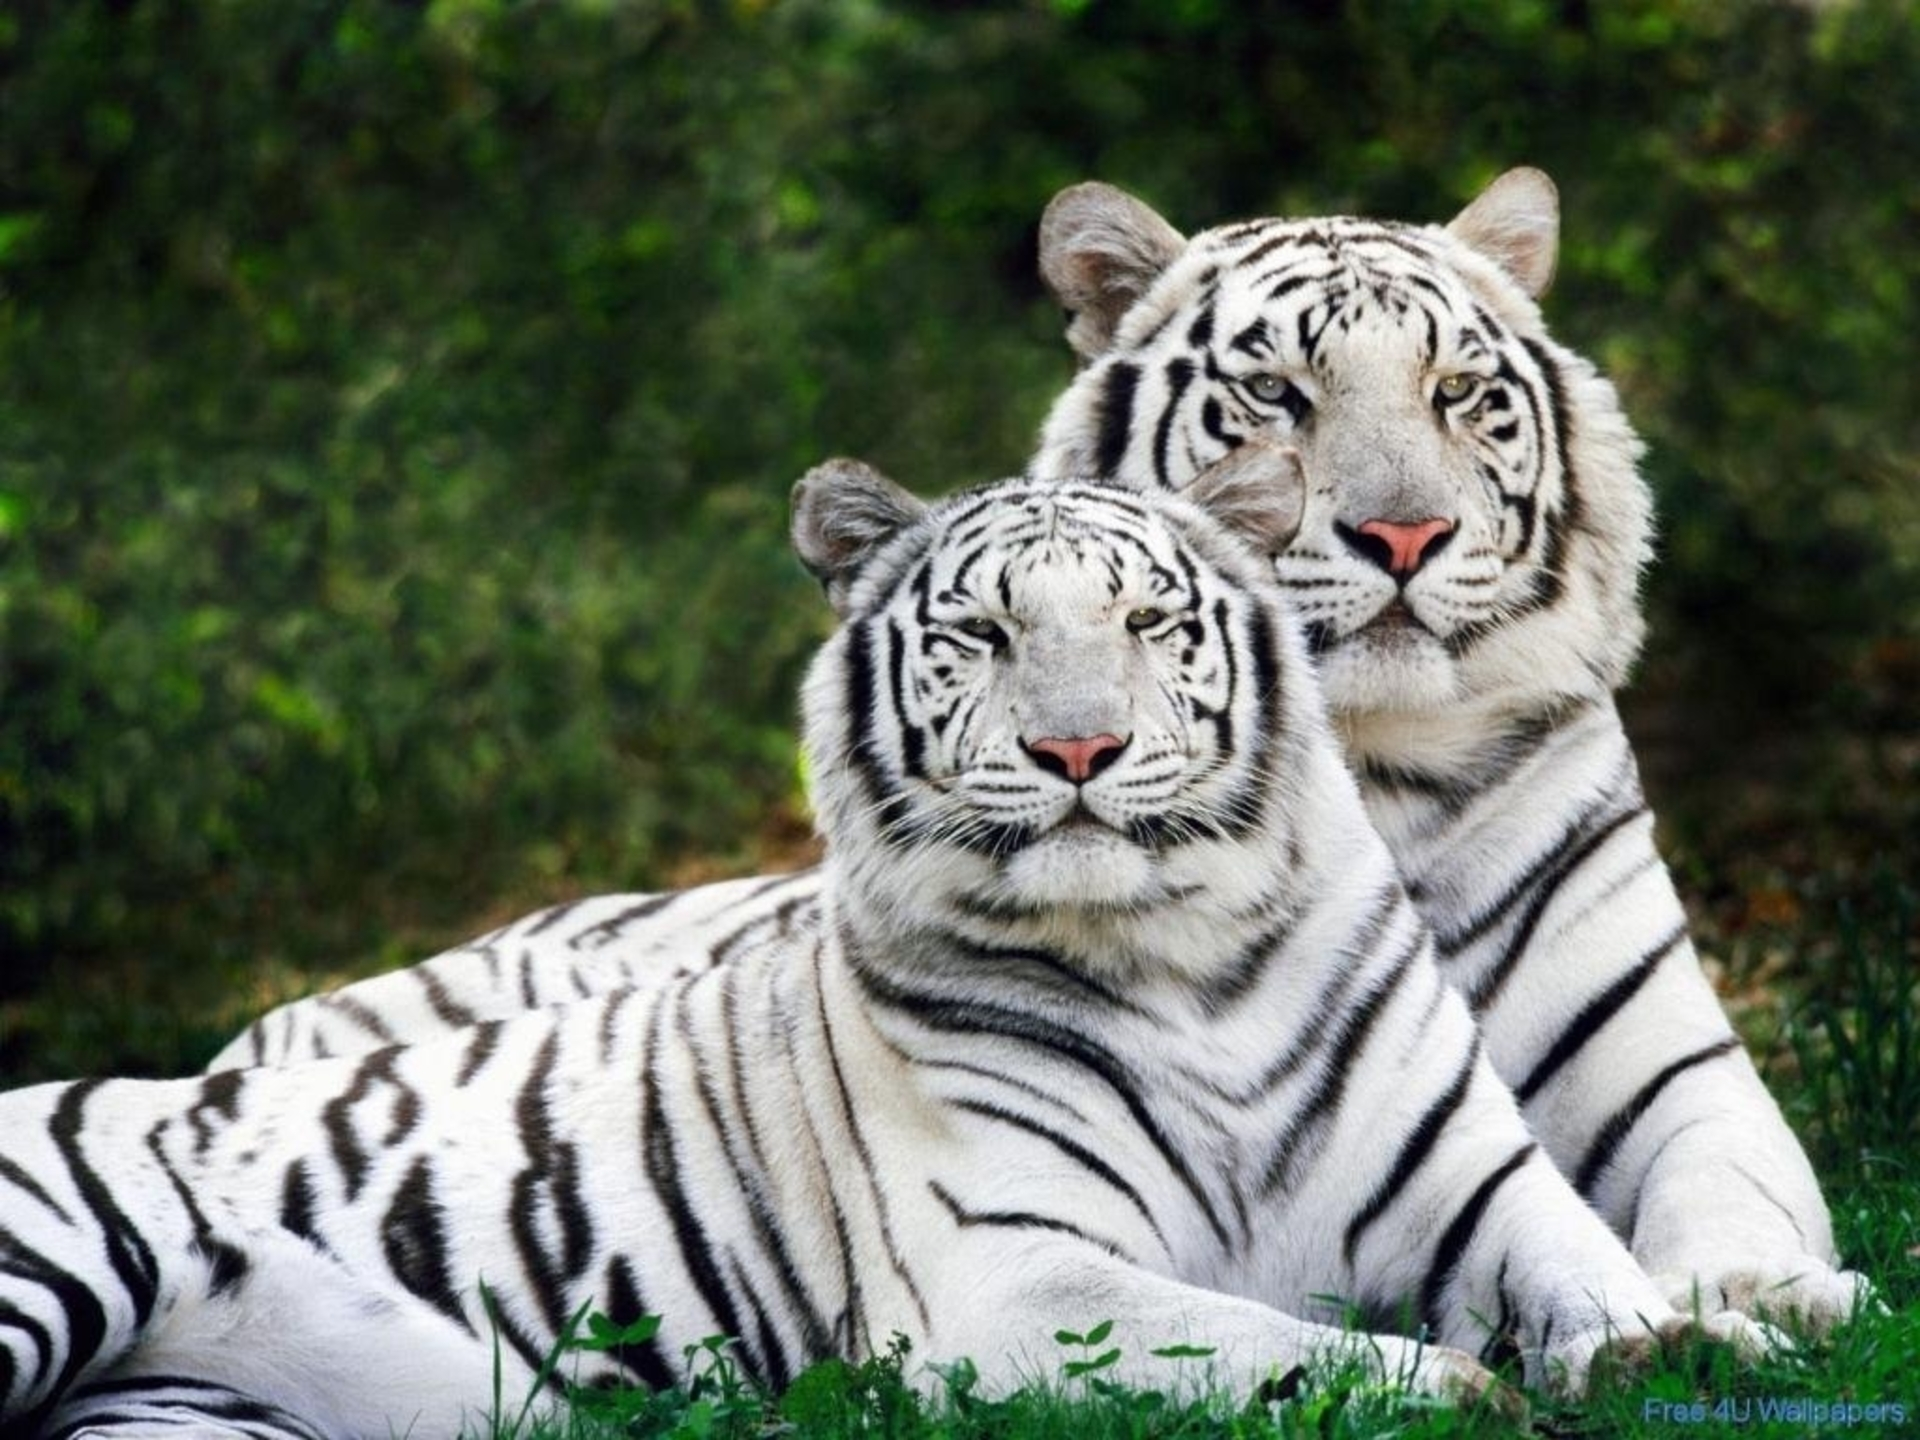 White Tigers Screensavers Resolution 1920x1440 pixelsuper cool 1920x1440